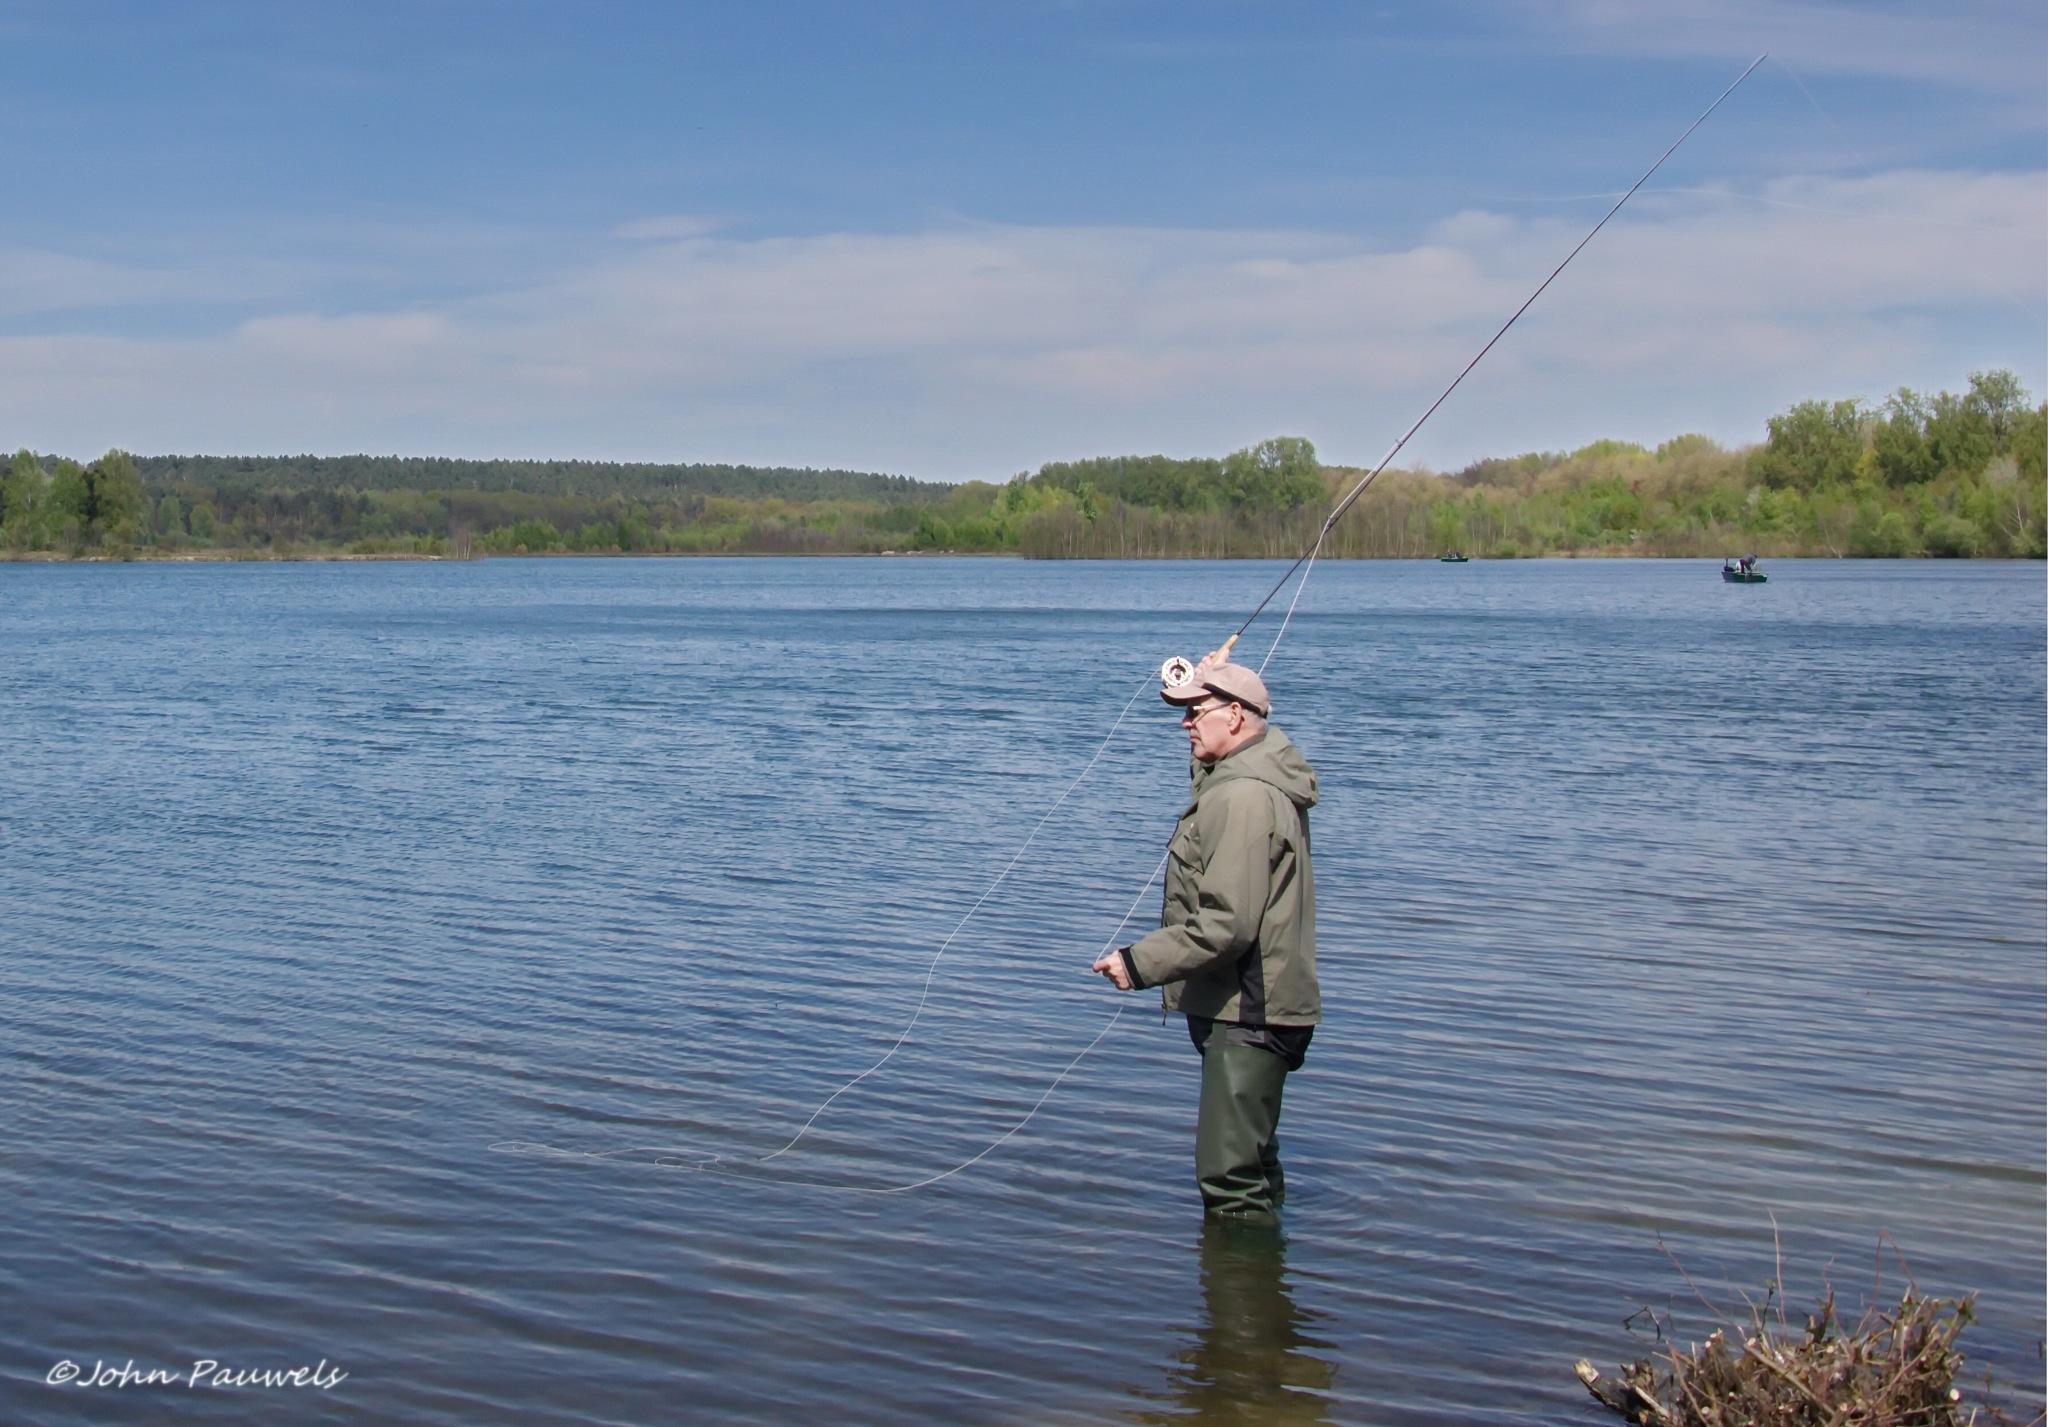 The fisherman. by John Pauwels